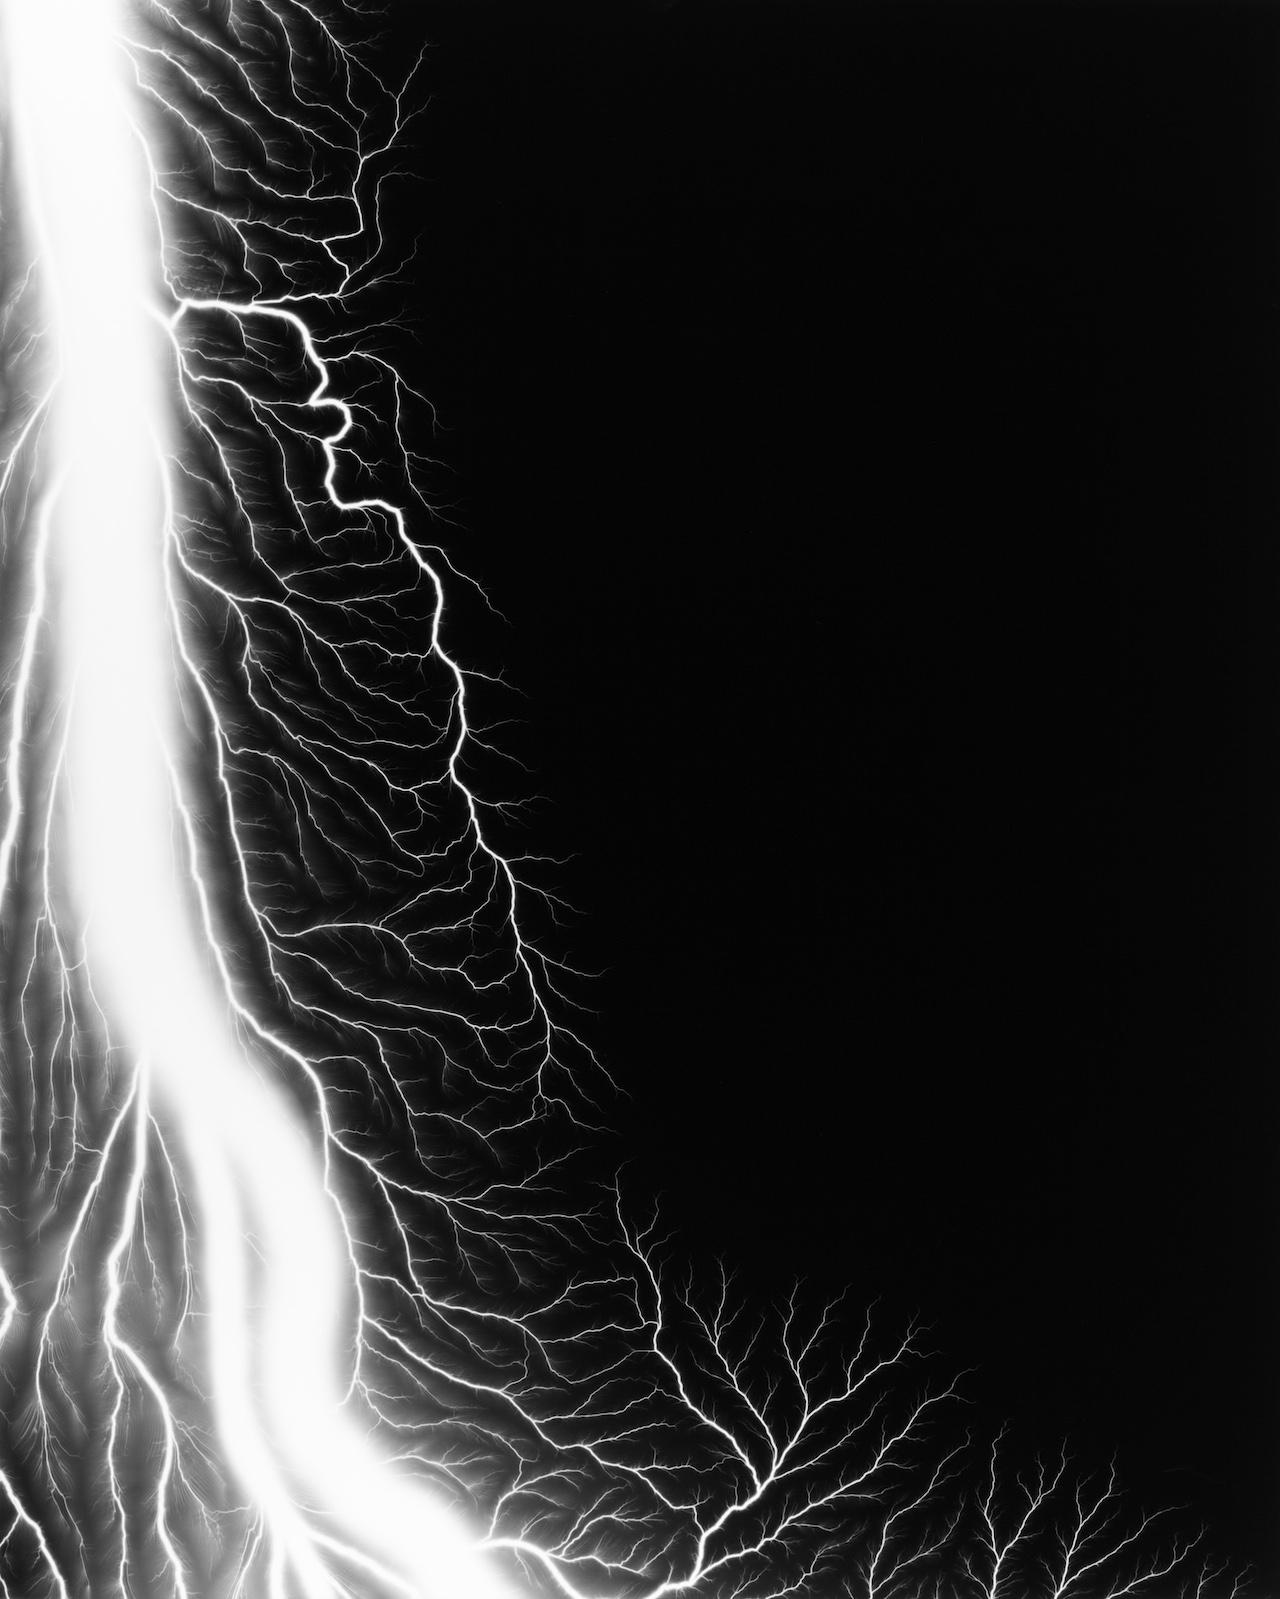 Lightning Fields 216, 2009, Hiroshi Sugimoto © Hiroshi Sugimoto, courtesy Fraenkel Gallery, San Francisco